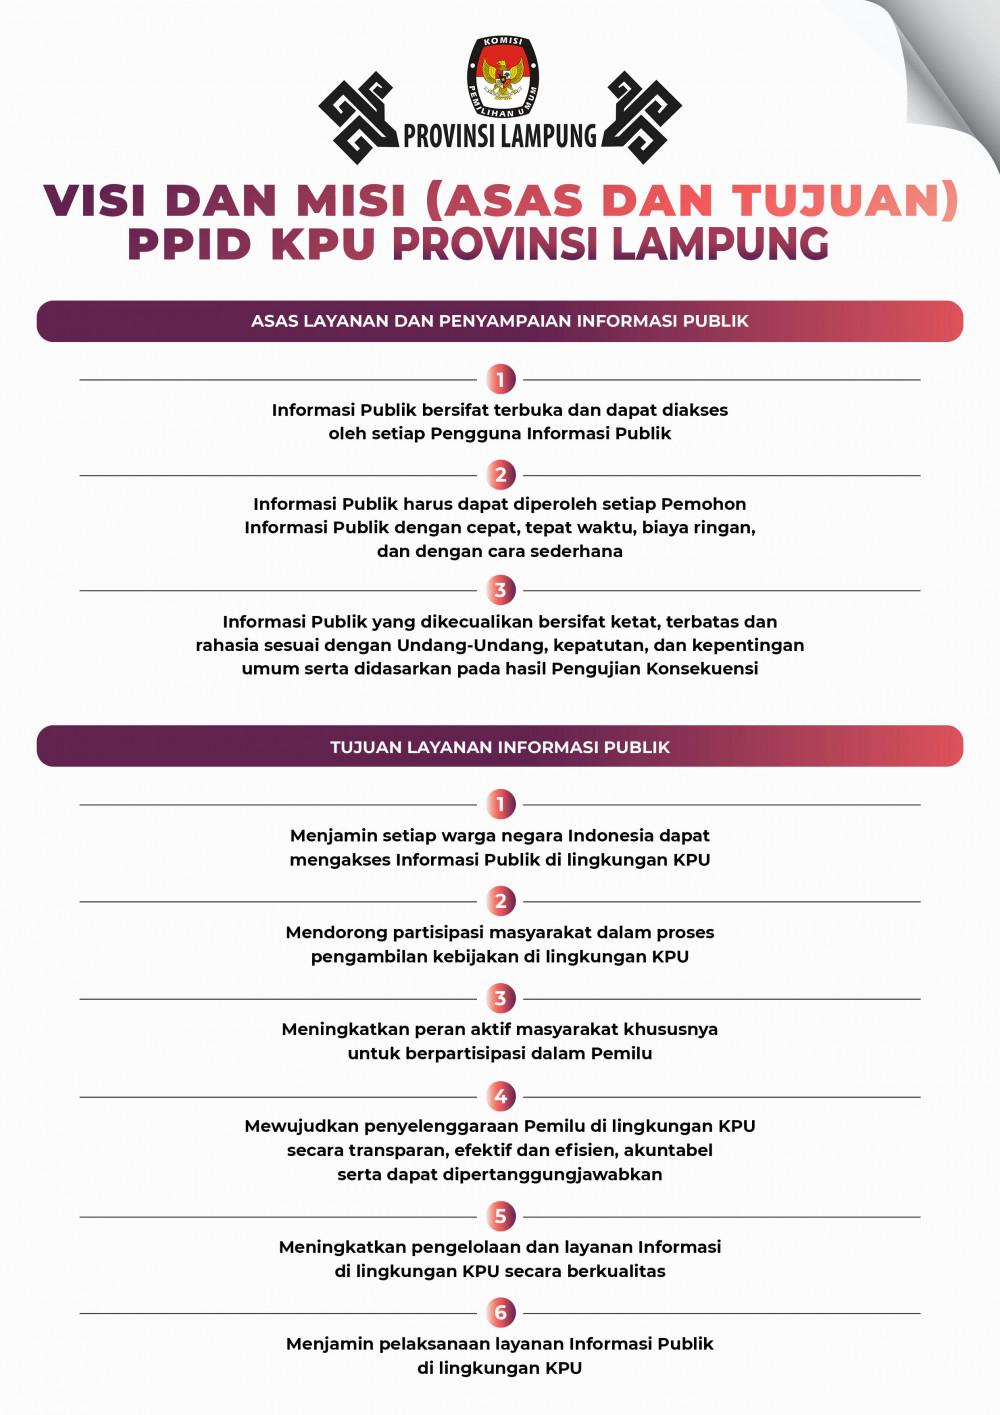 Visi Misi PPID KPU Provinsi Lampung